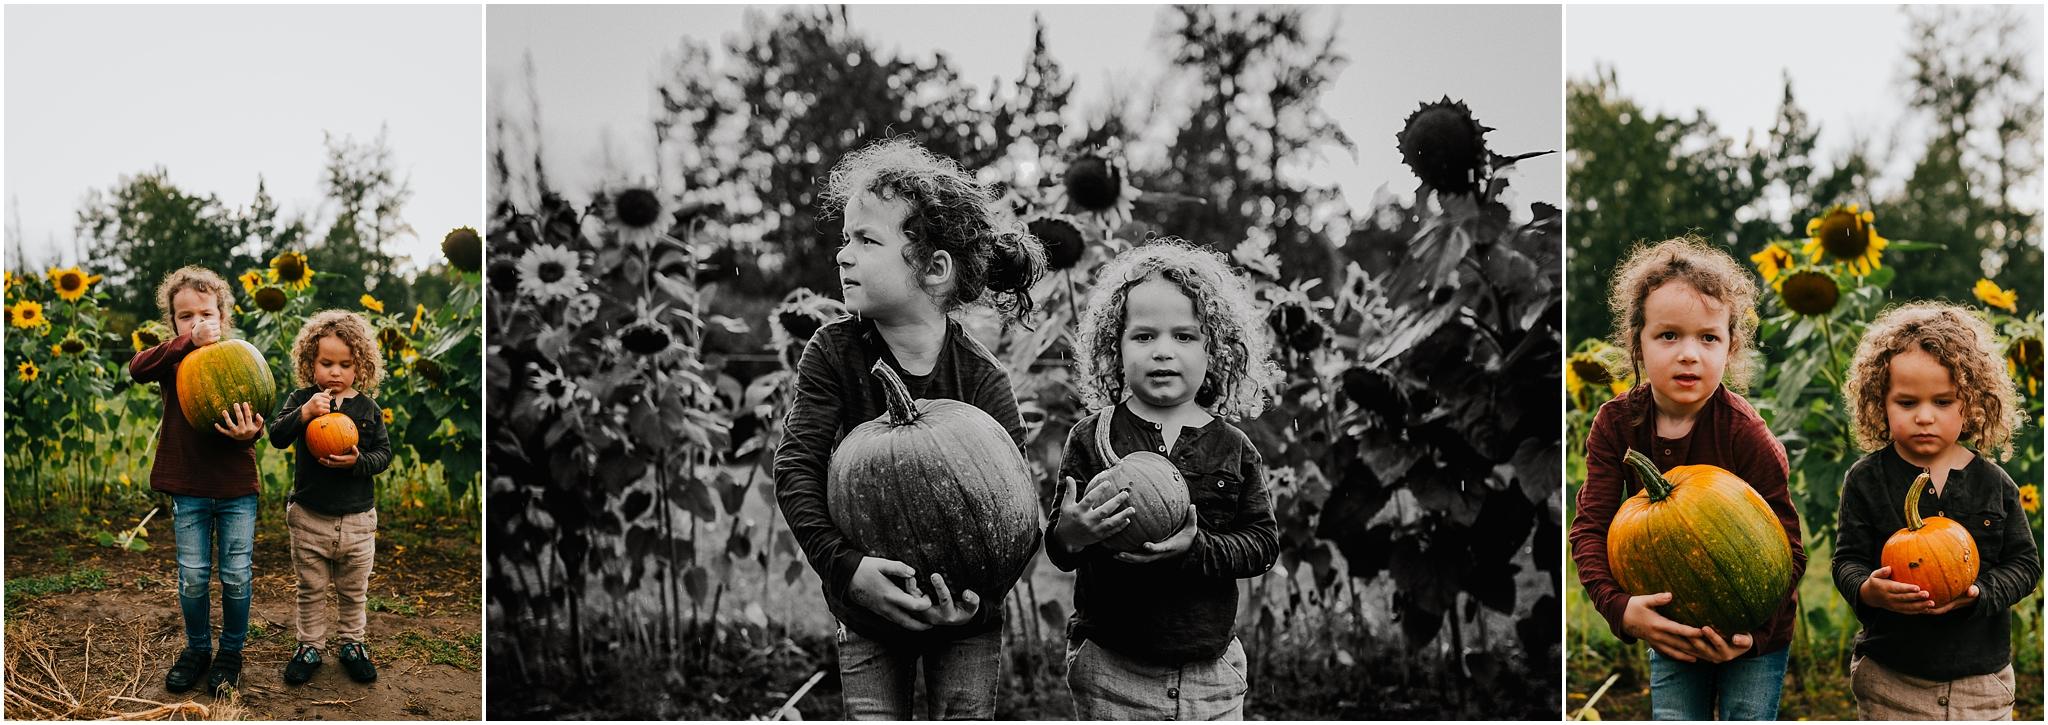 Edmonton Family Photographer - Edmonton Photography - Pick your own pumpkins Edmonton